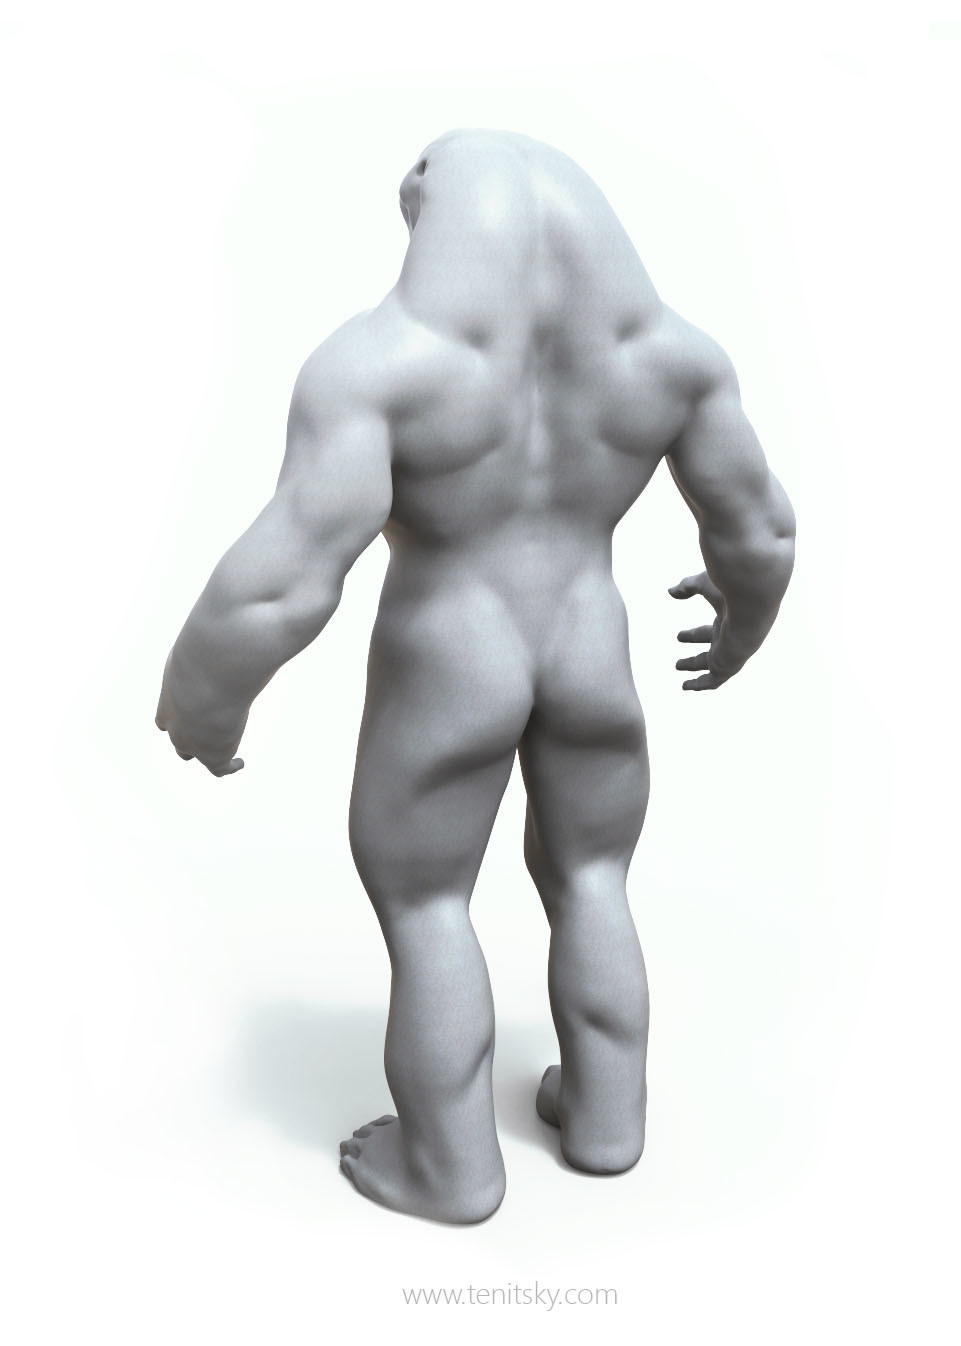 Anton tenitsky 0003 anton tenitsky 004 butt naked